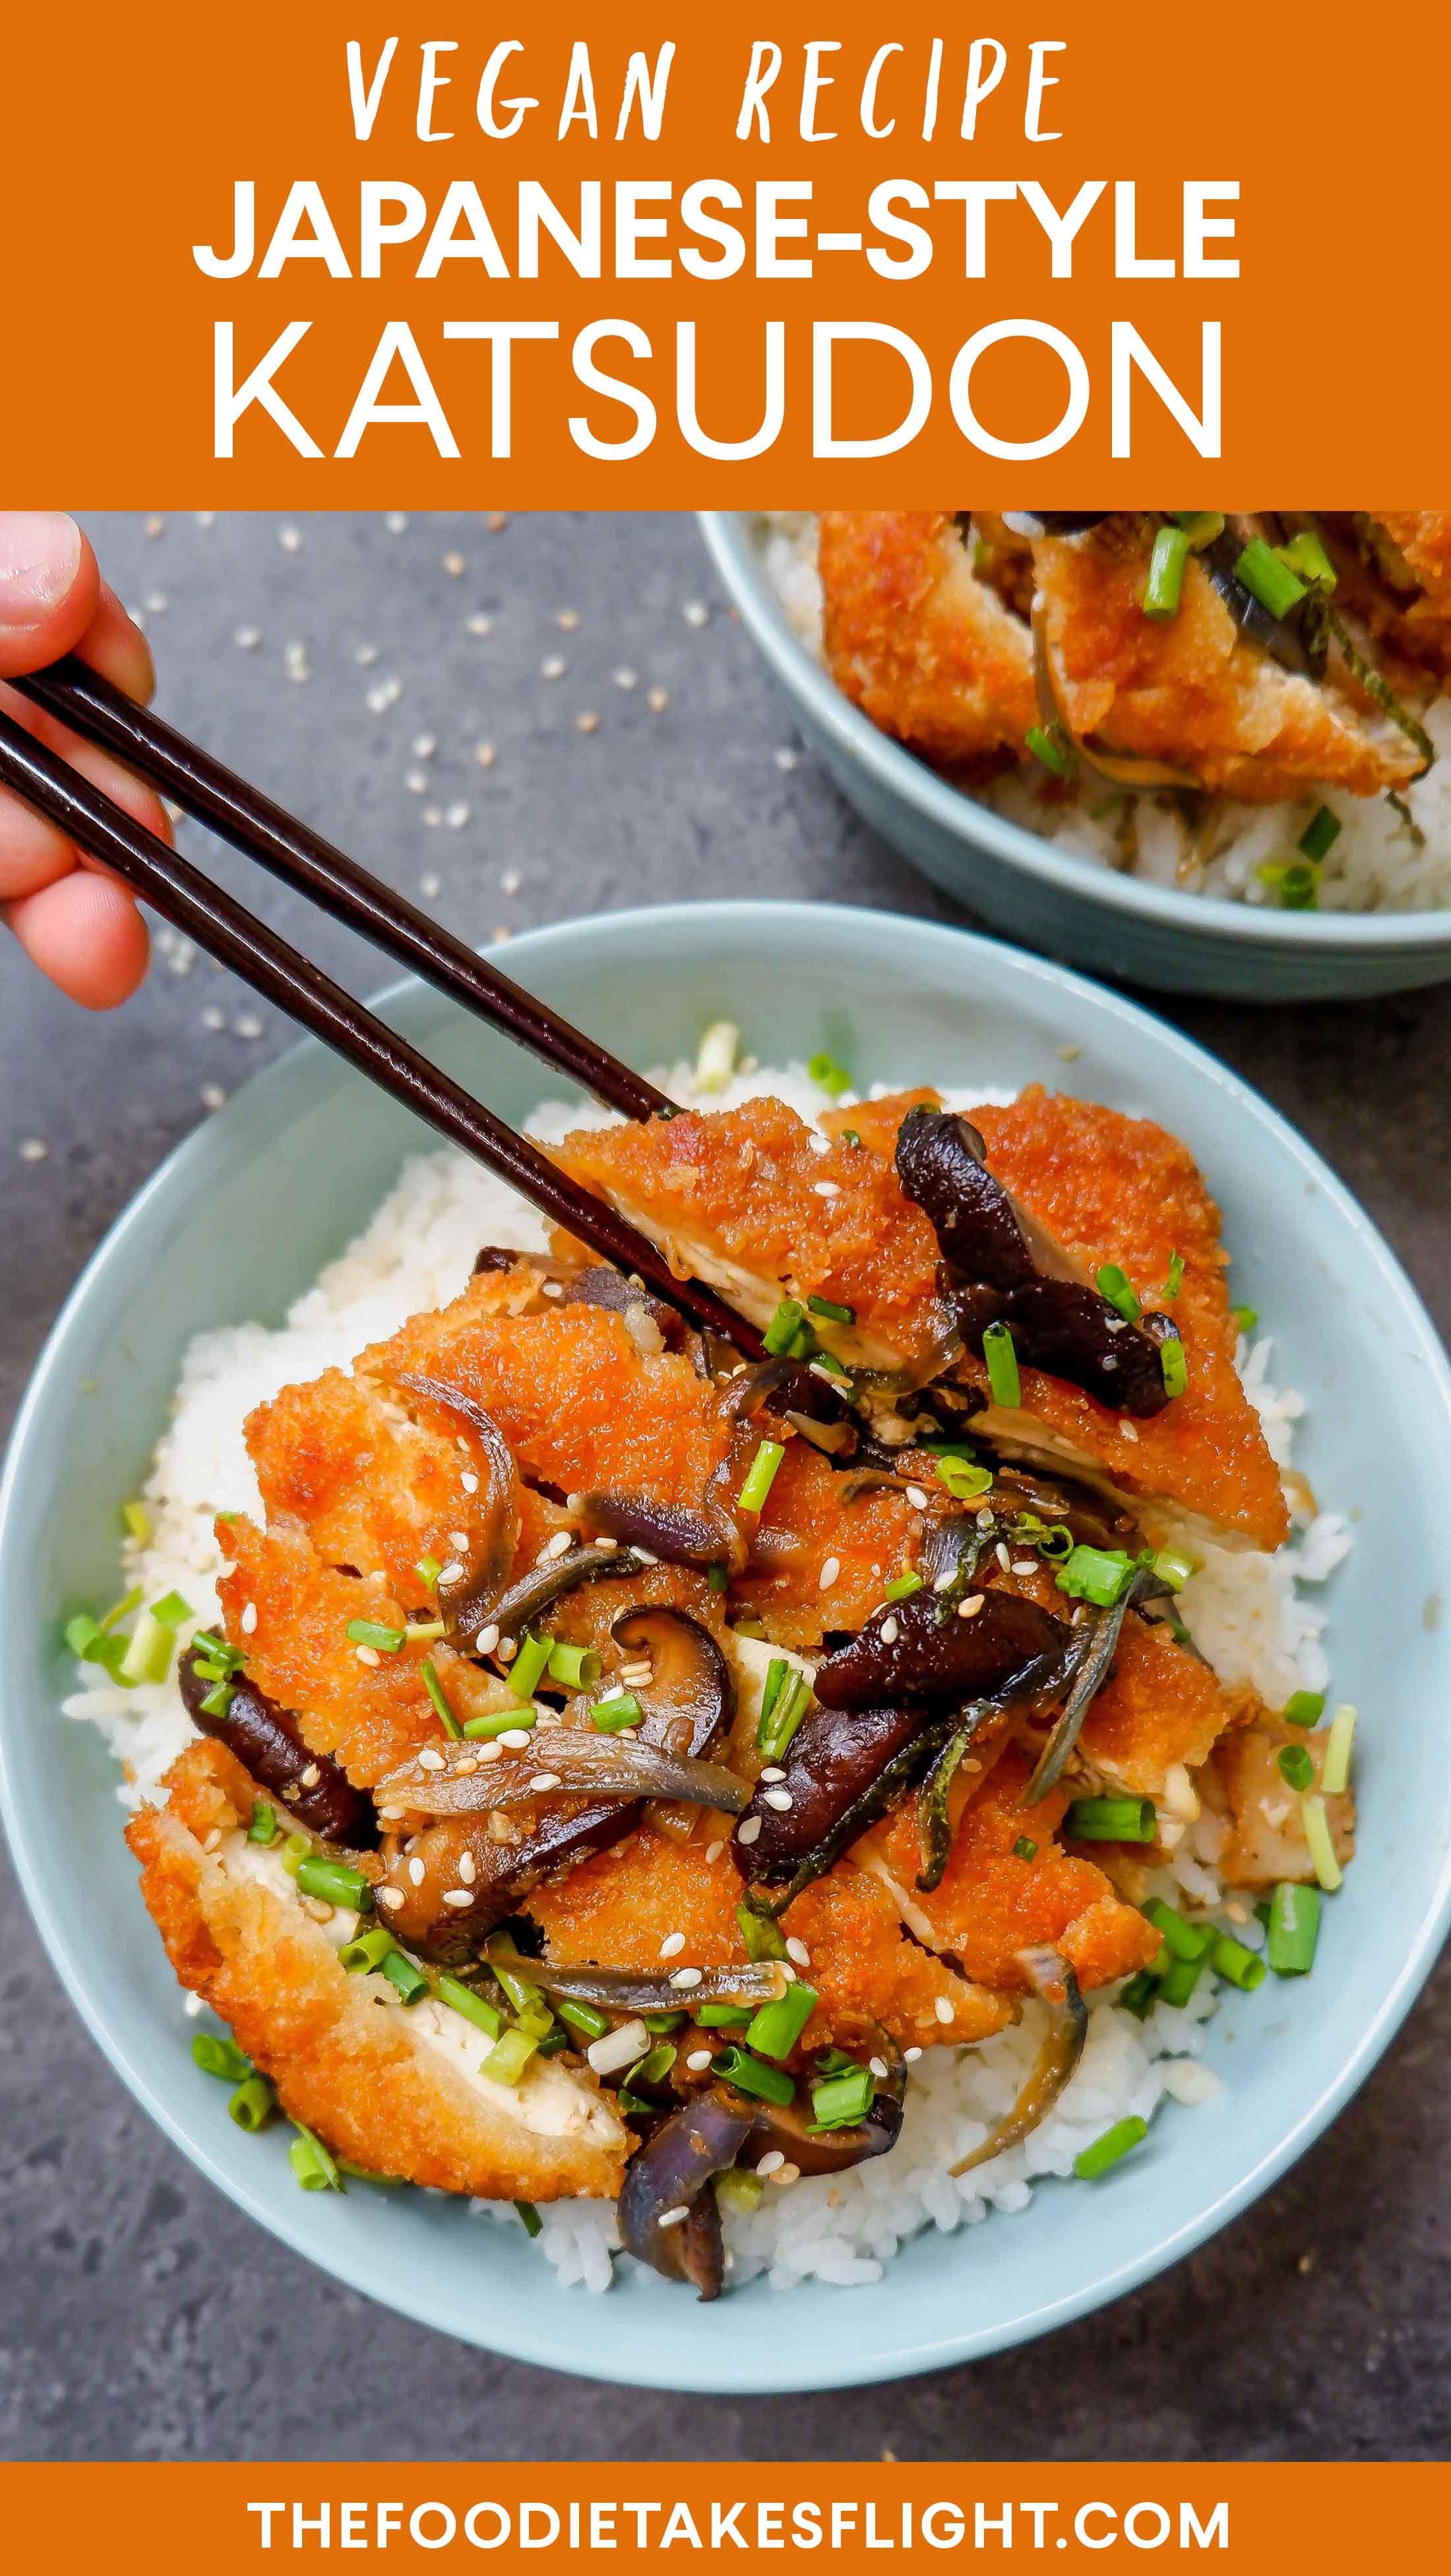 Japanese Style Katsudon Rice Bowls Vegan Recipe Recipe Japanese Vegetarian Recipes Vegan Asian Recipes Vegan Japanese Food